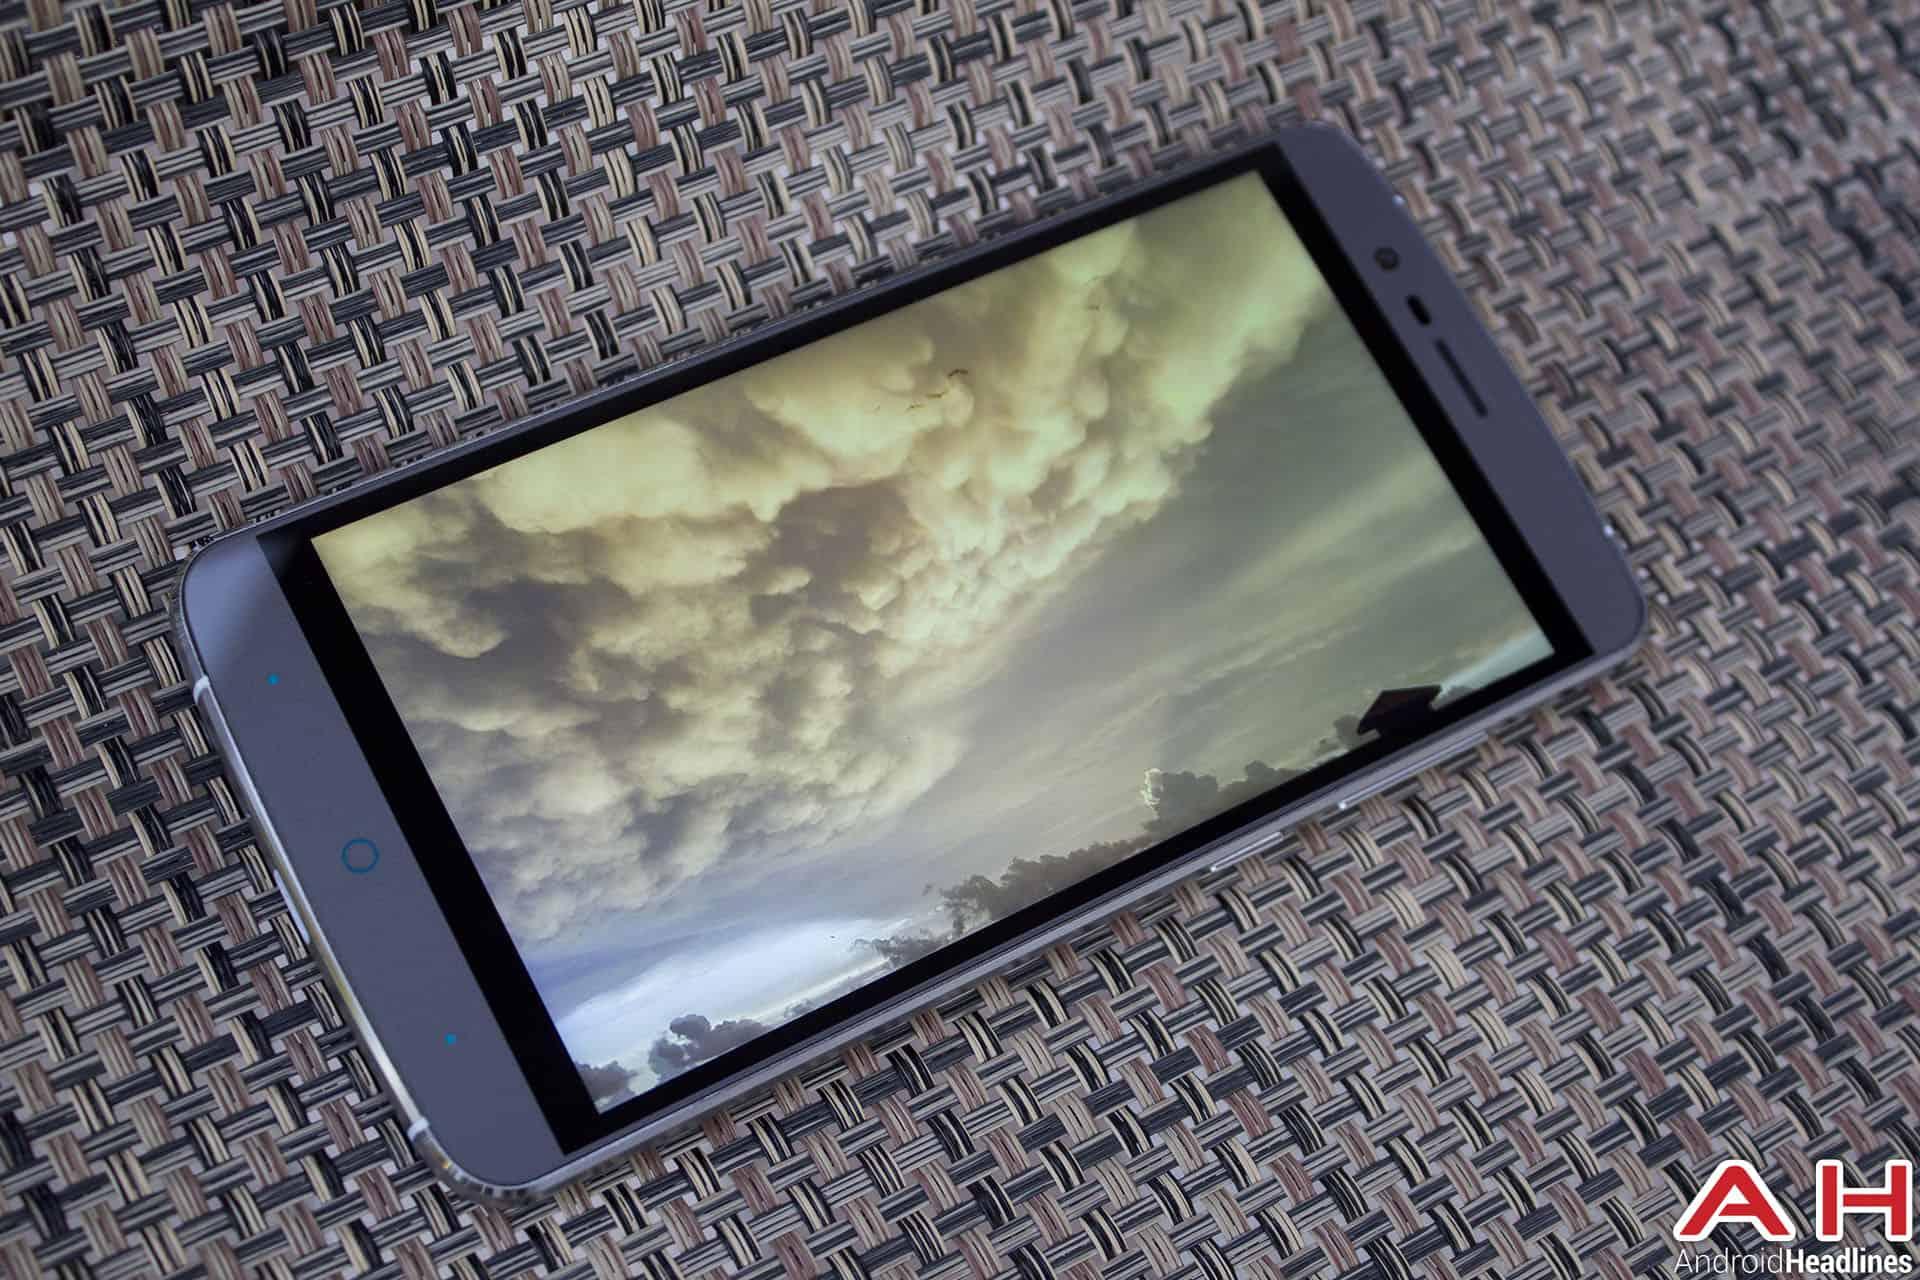 elephone-p8000-review-AH-display